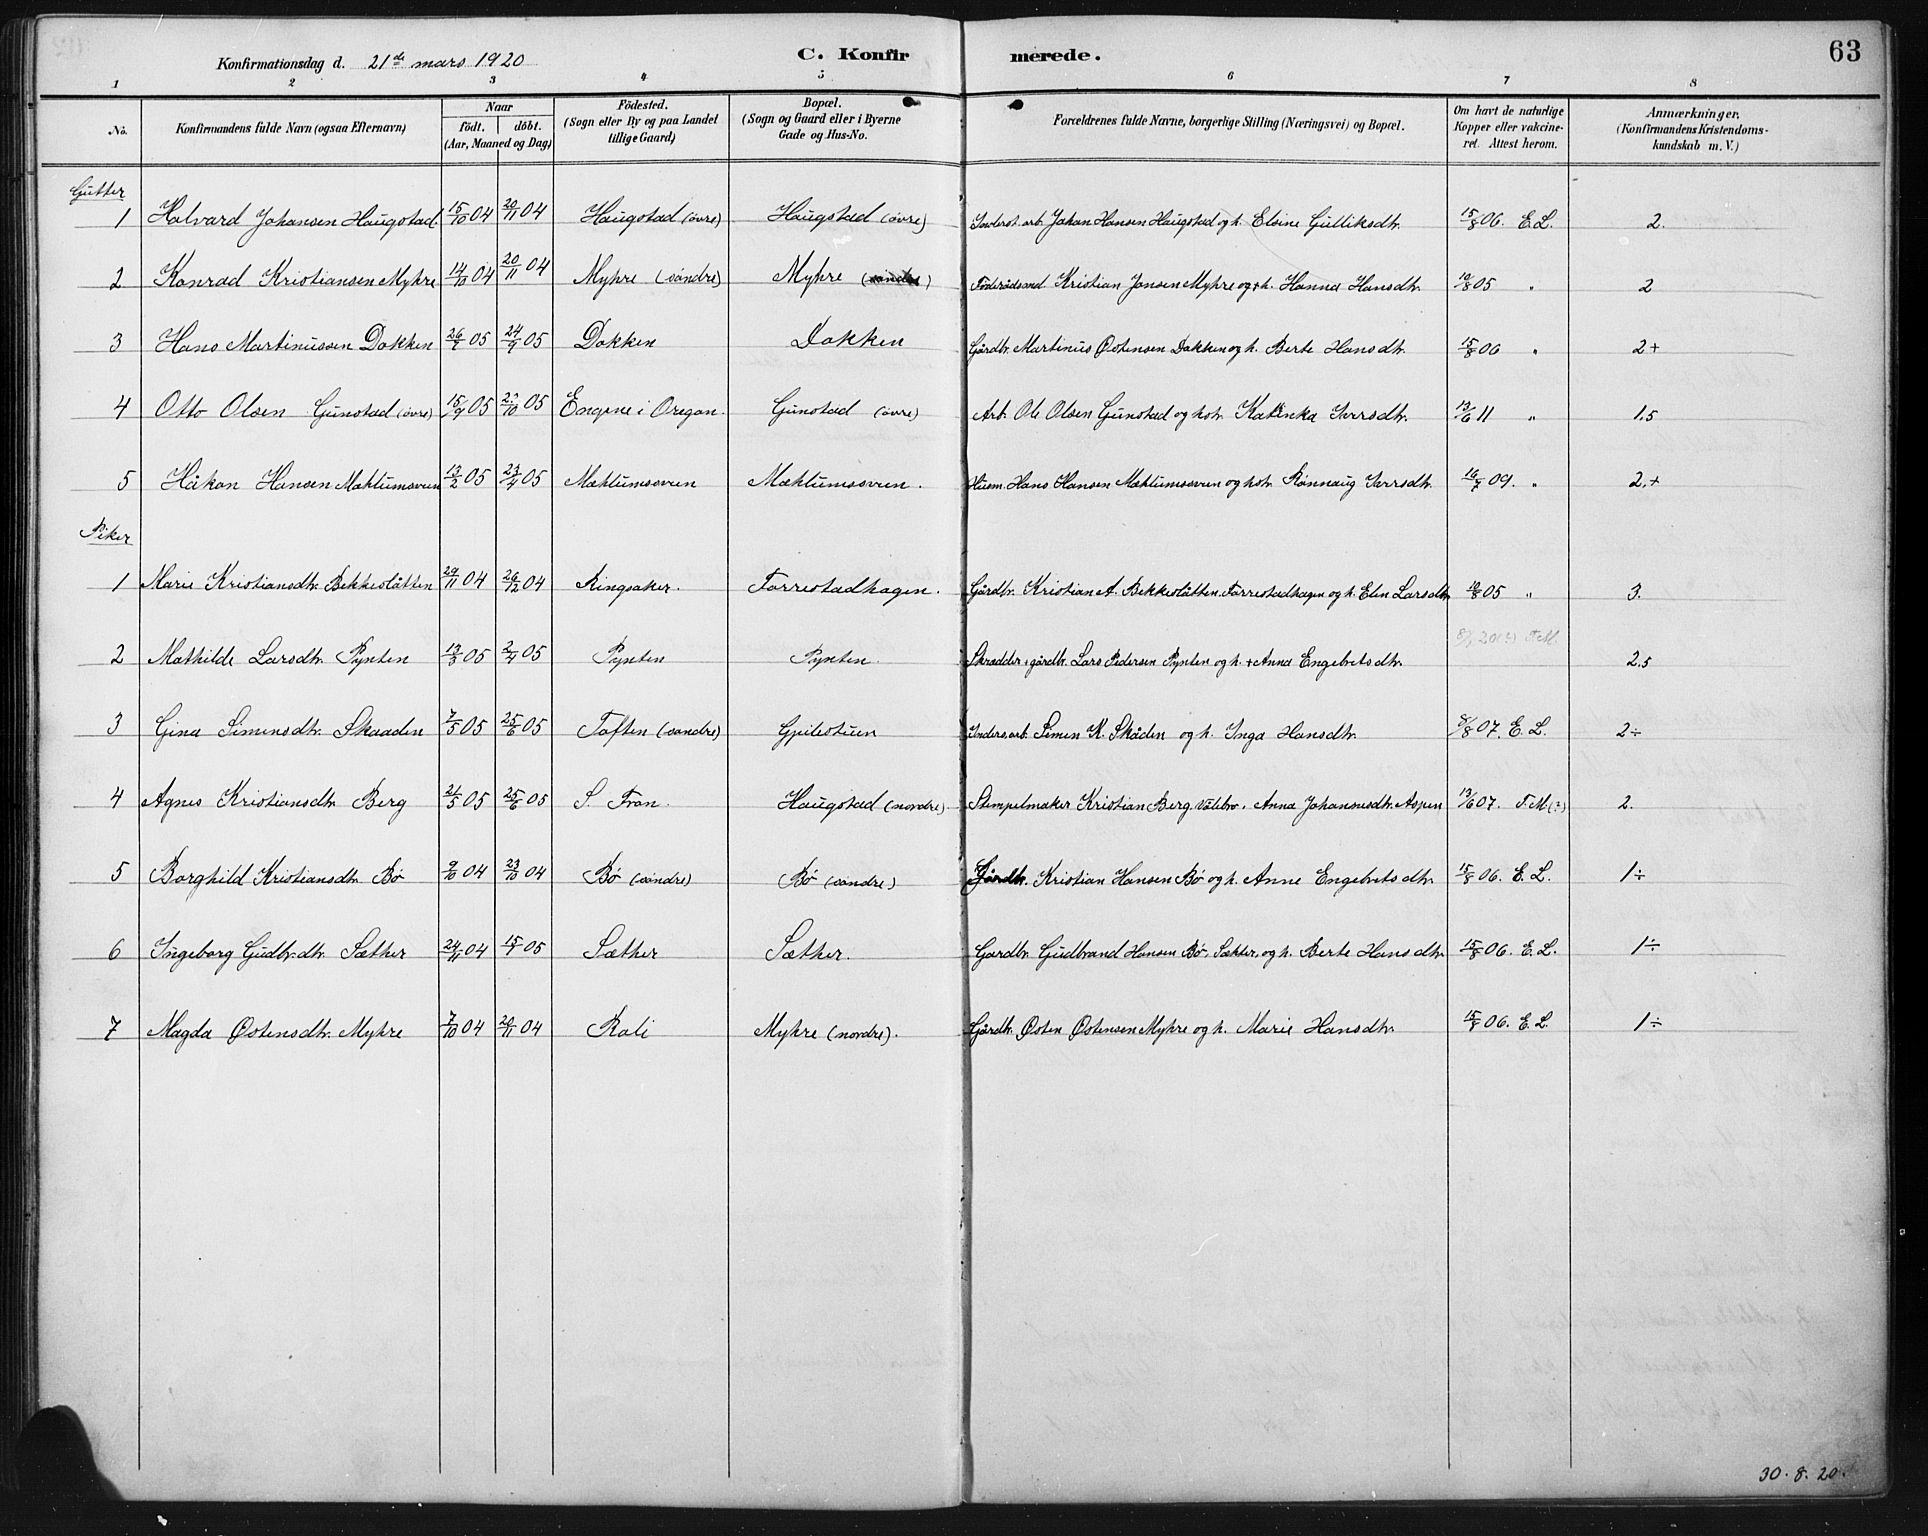 SAH, Ringebu prestekontor, Klokkerbok nr. 8, 1890-1922, s. 63